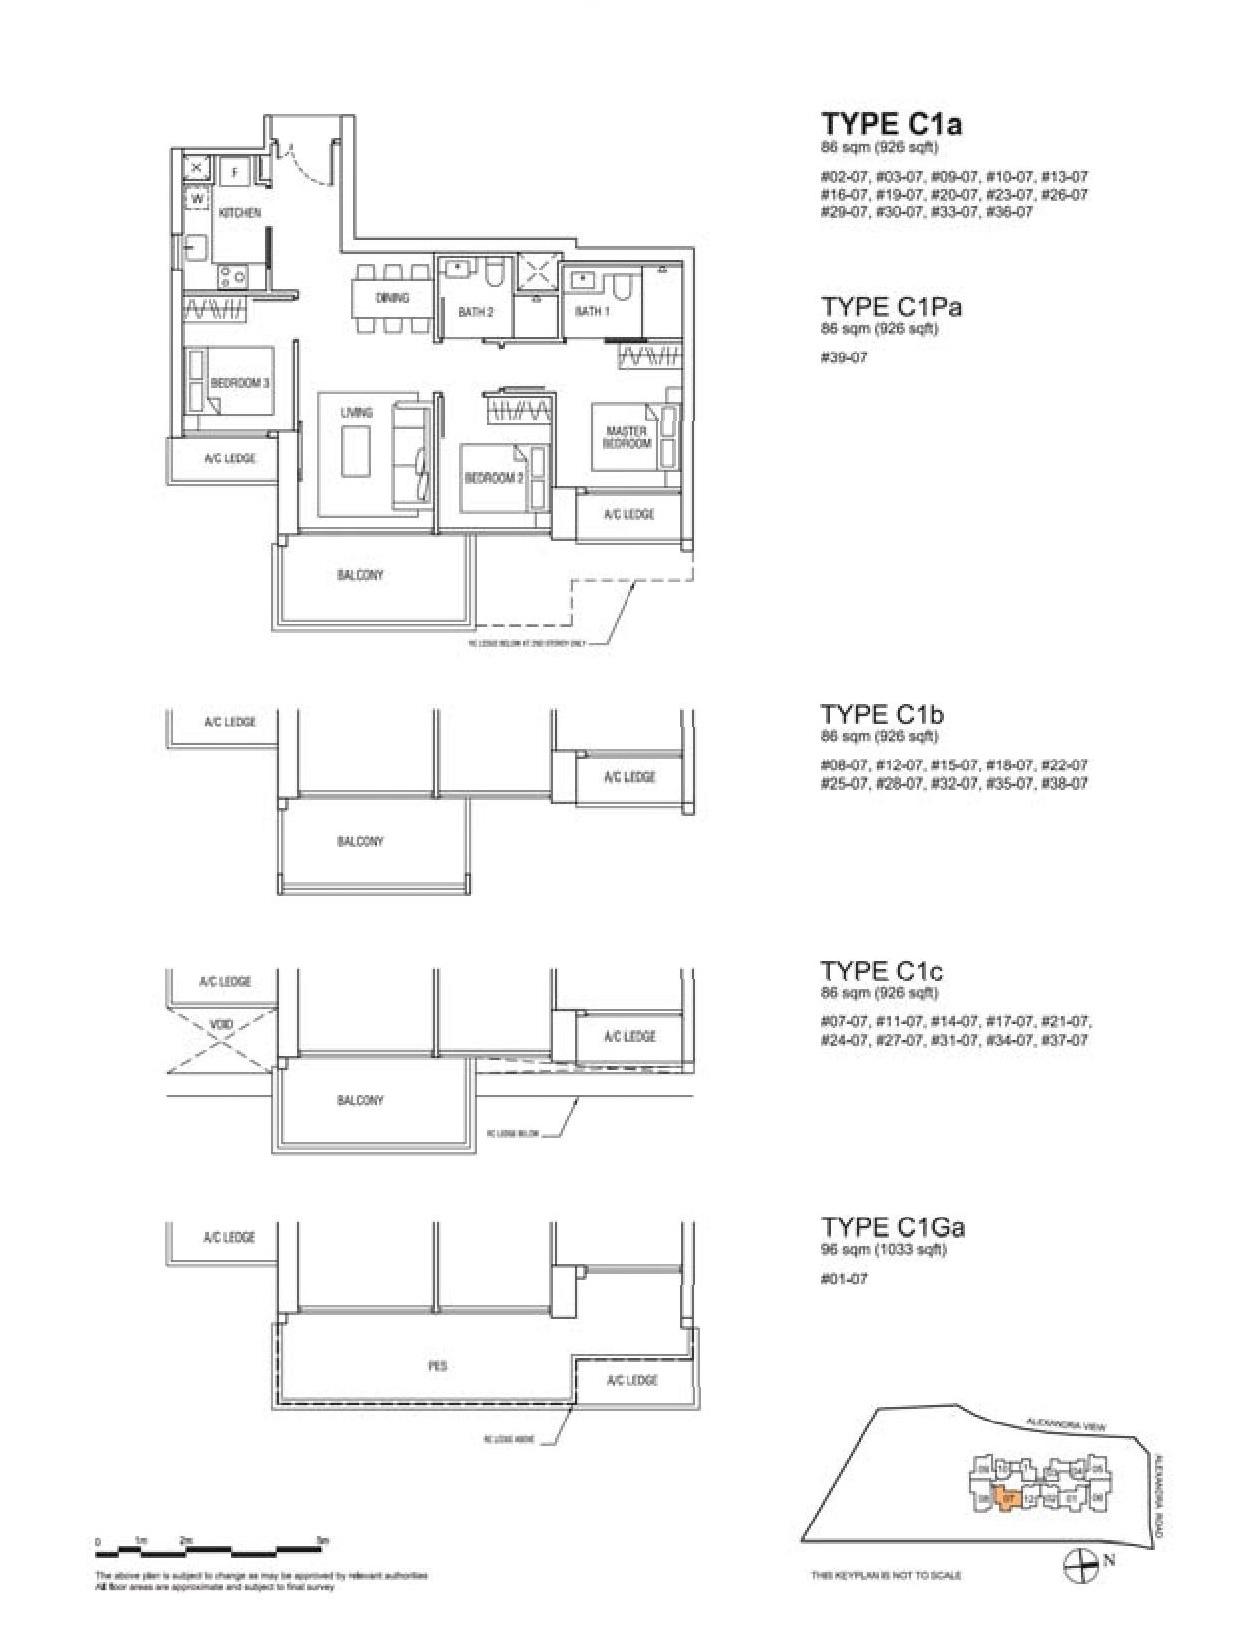 Alex Residences 3 Bedroom Floor Plans Type C1a, C1Pa, C1b, C1c, C1Ga